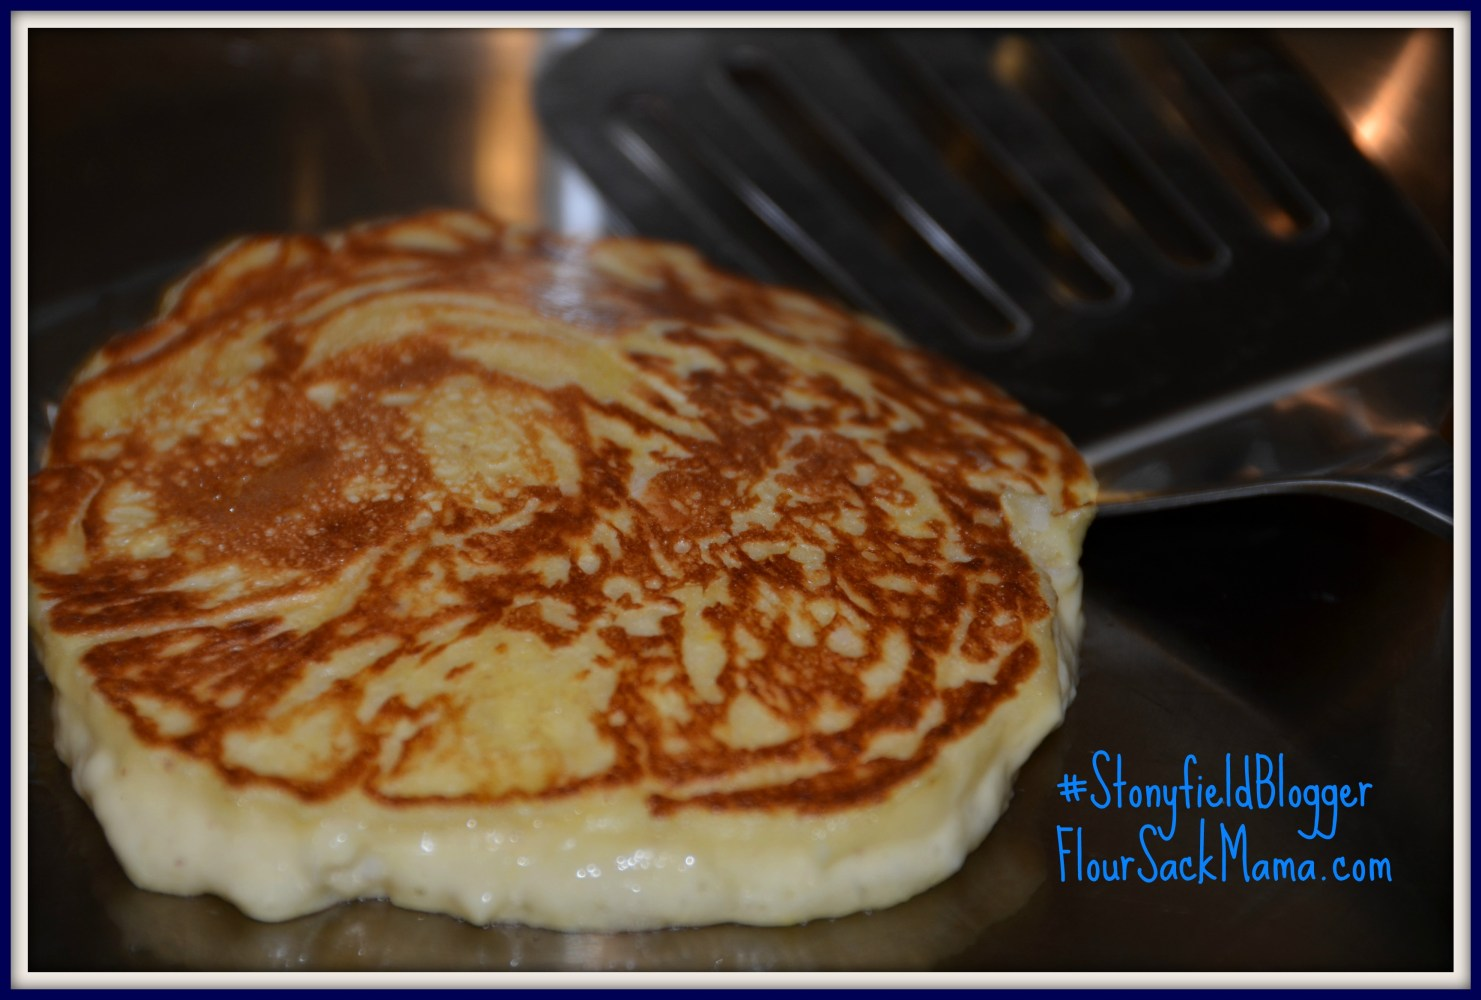 PancakeFlippedTooSoonFlourSackMama